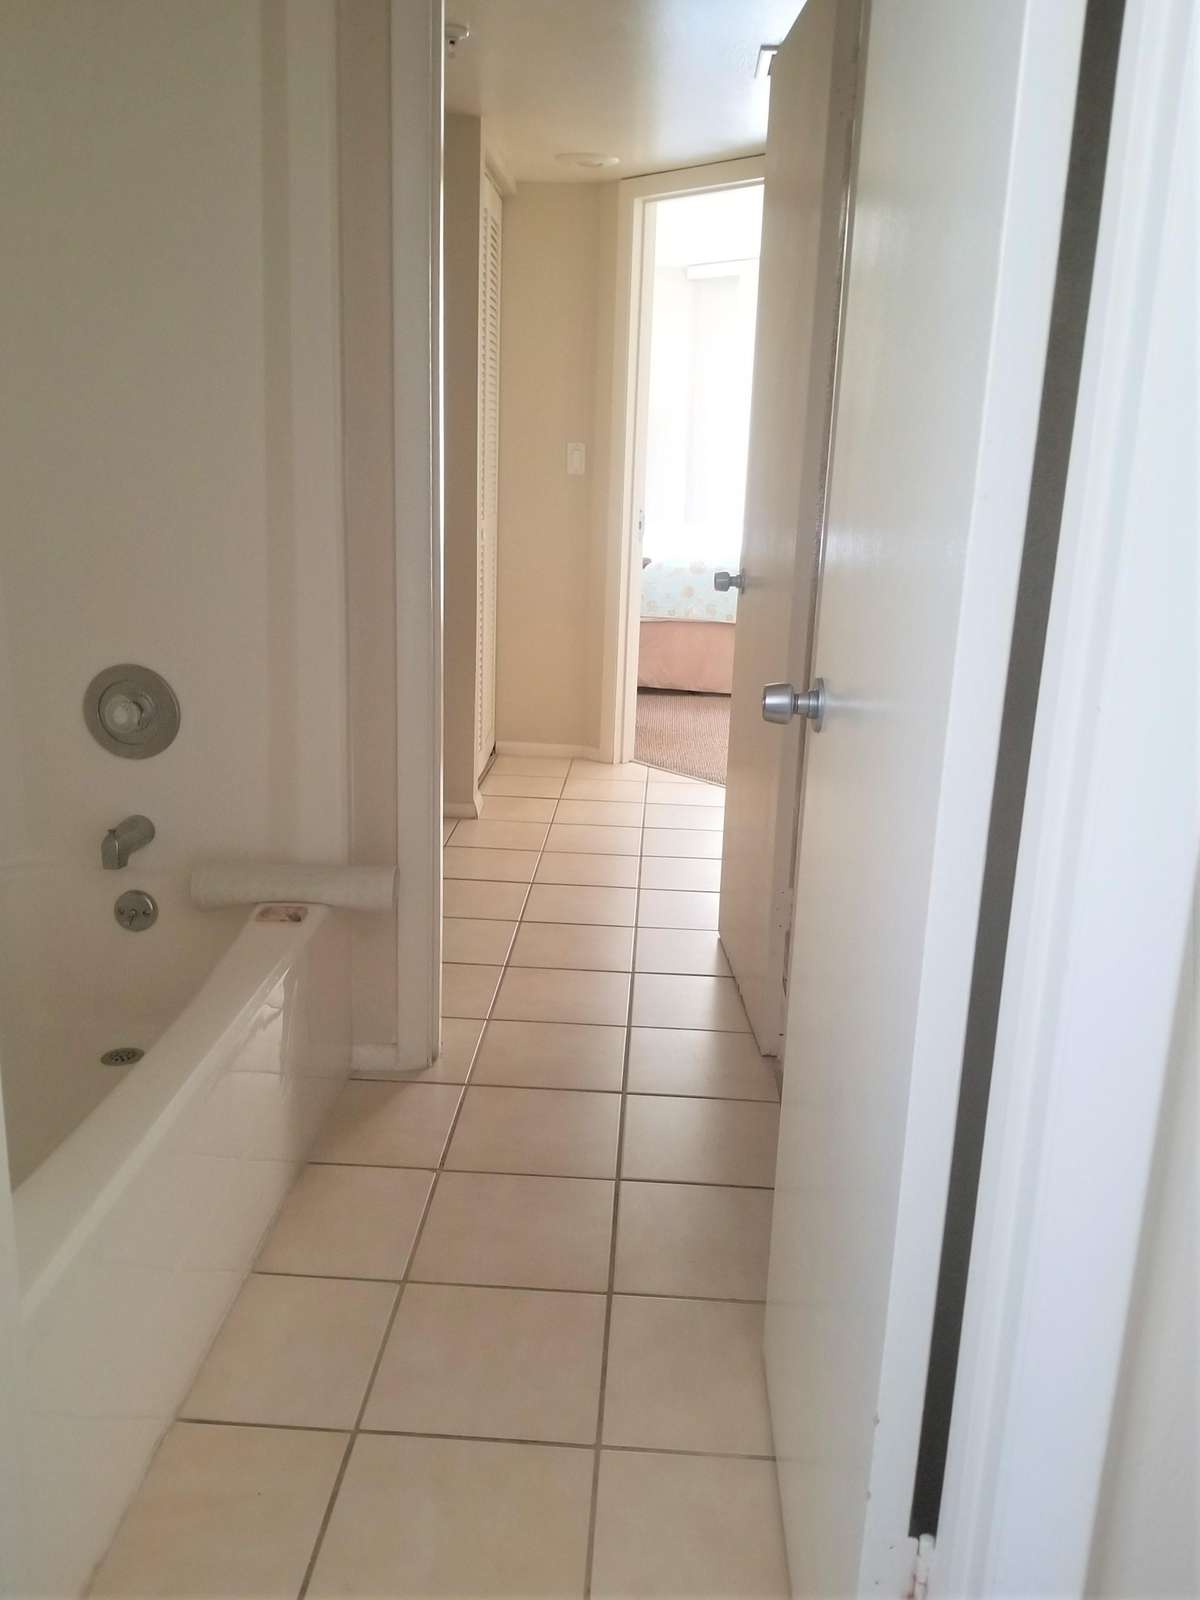 View thru bathrooms